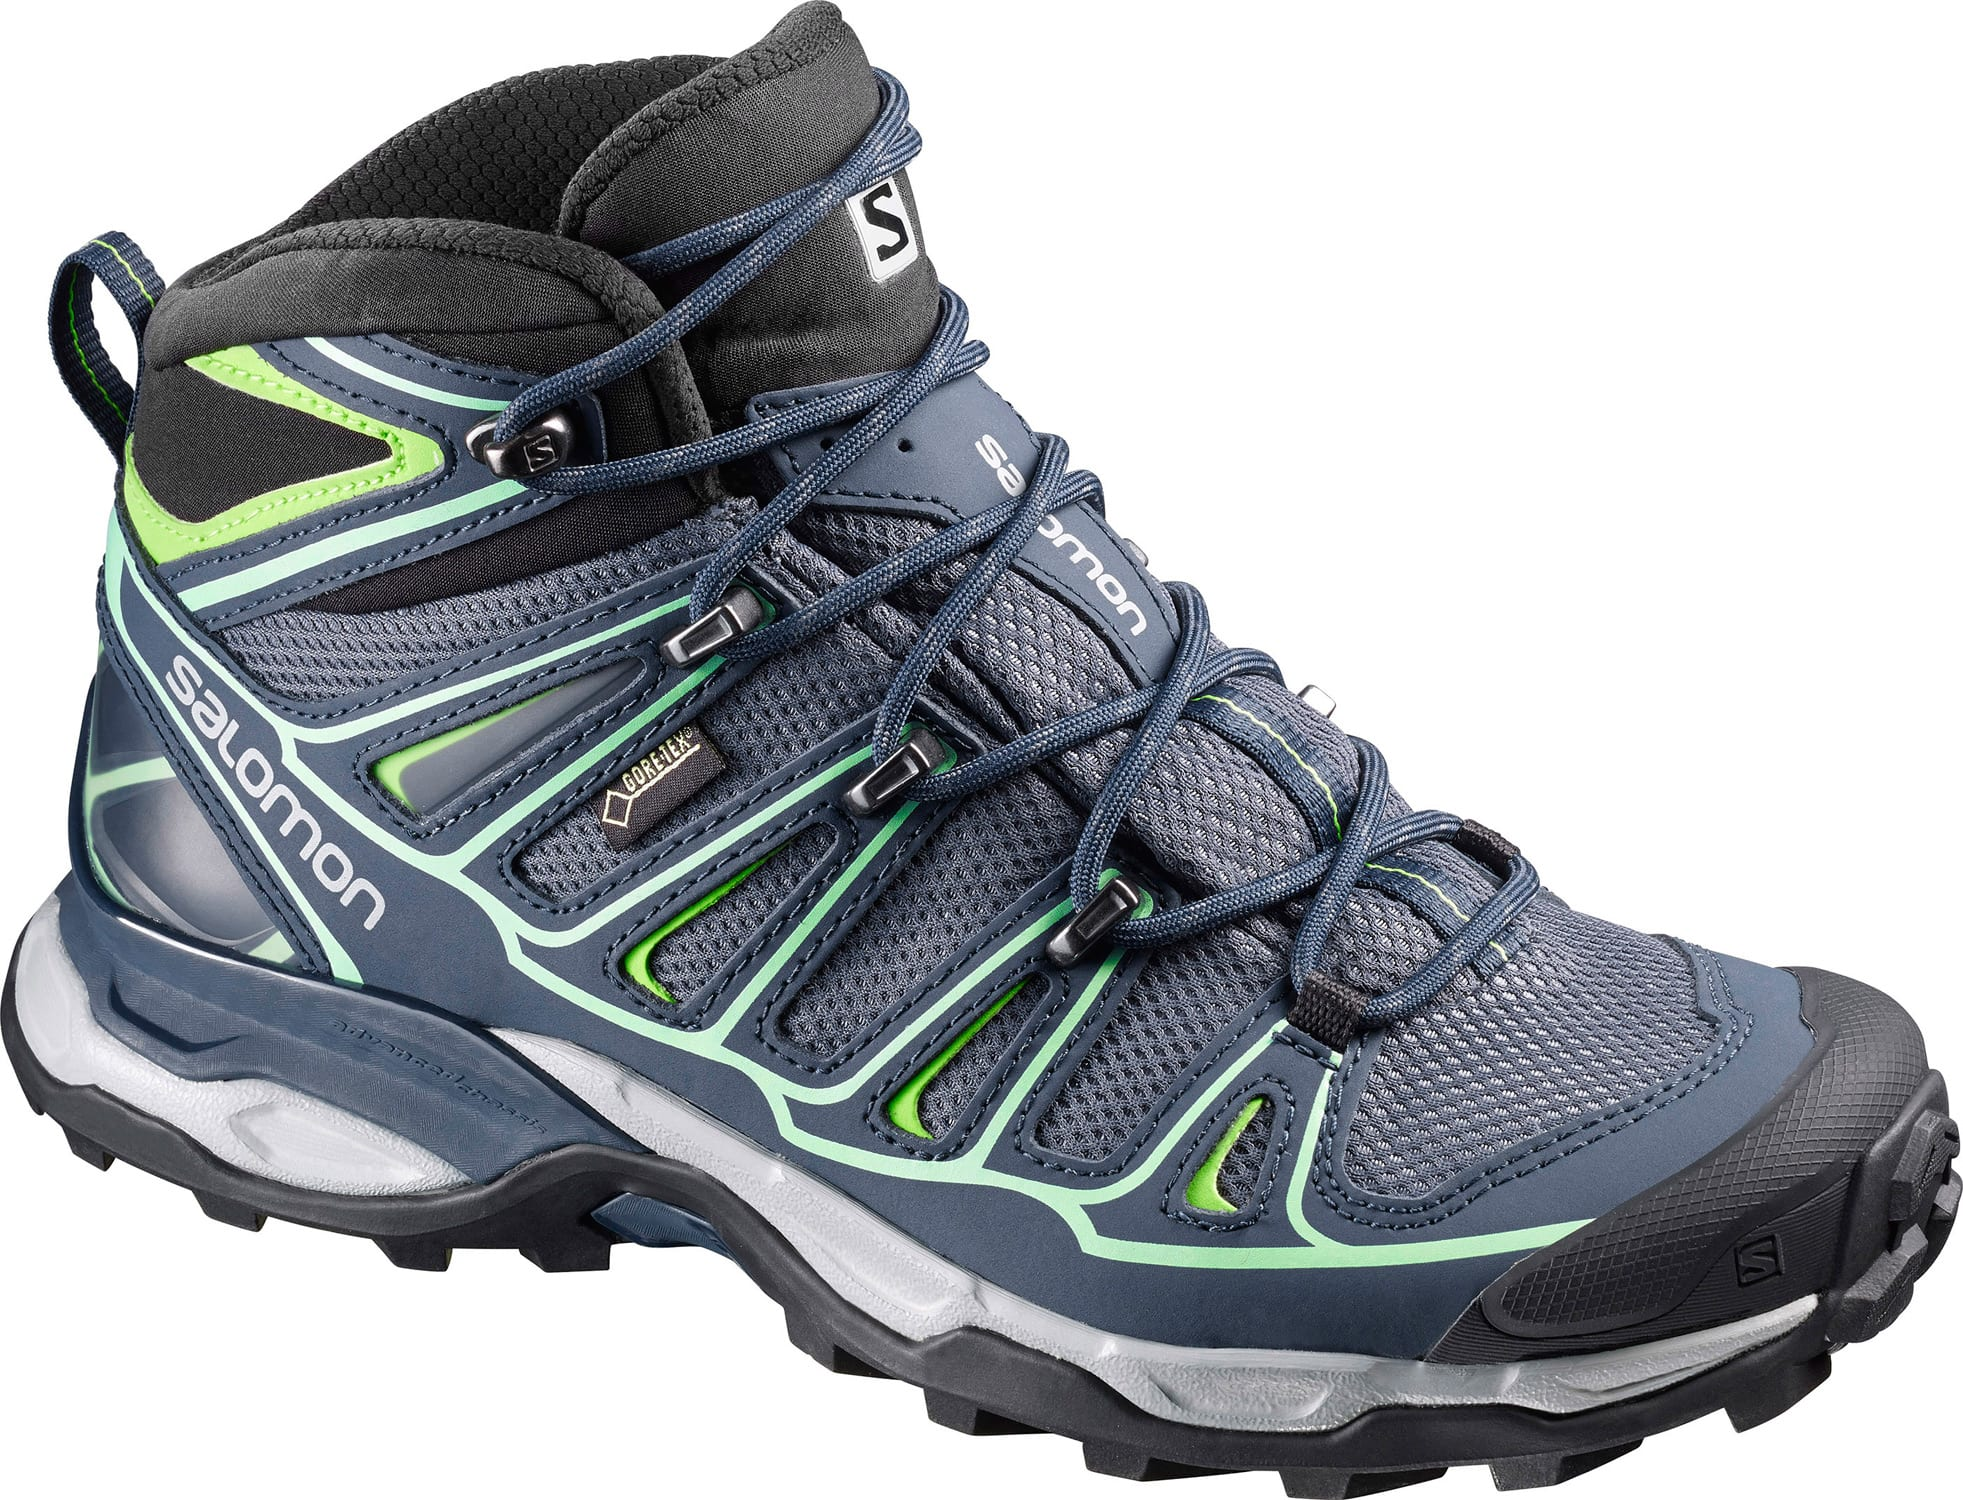 Vente Chaussures Trail Salomon   Salomon X Ultra 2 Gtx® W